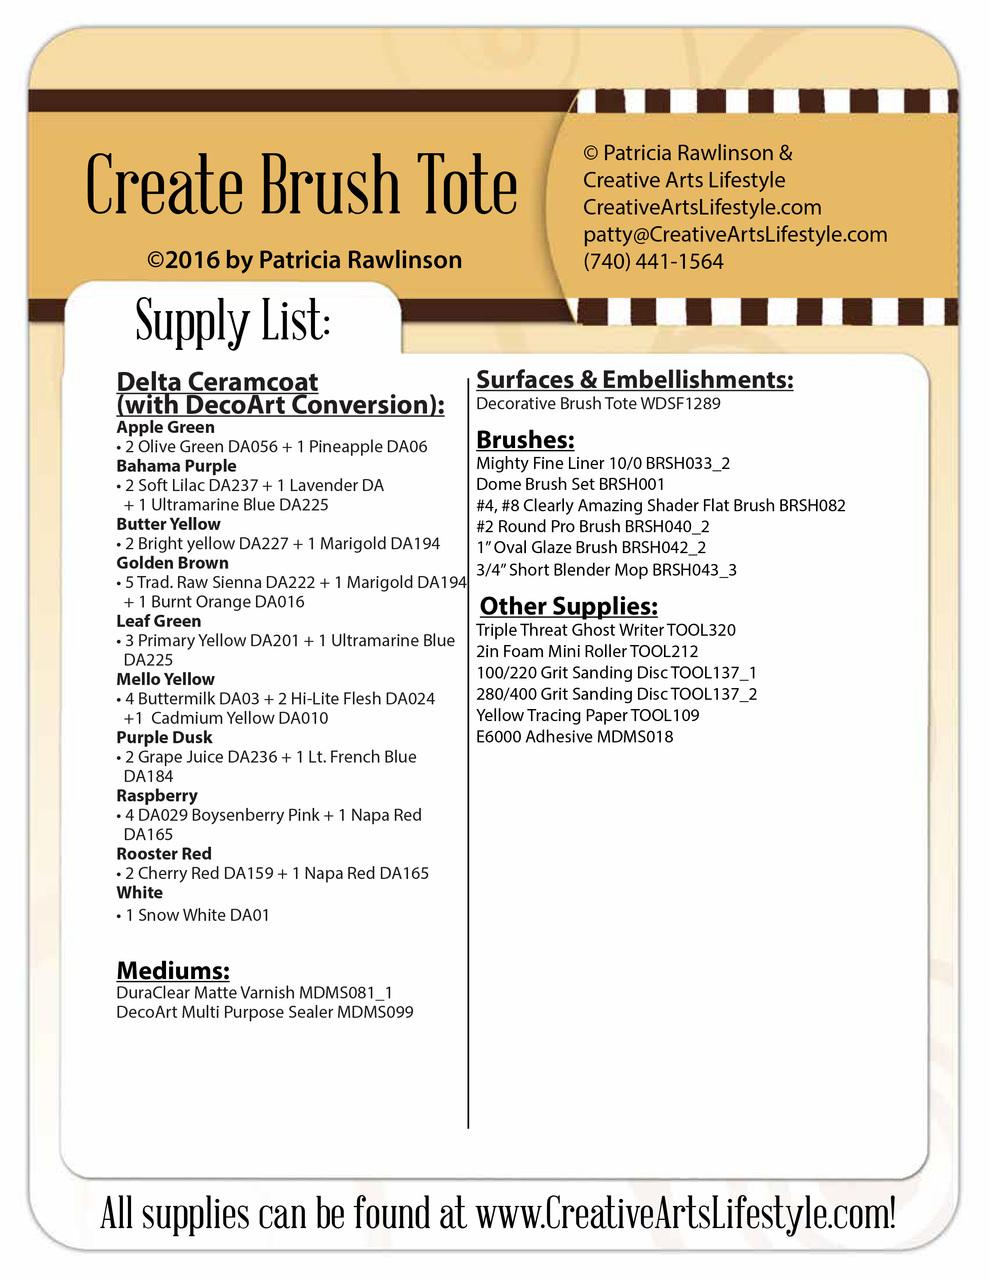 Create Brush Tote - E-Packet - Patricia Rawlinson